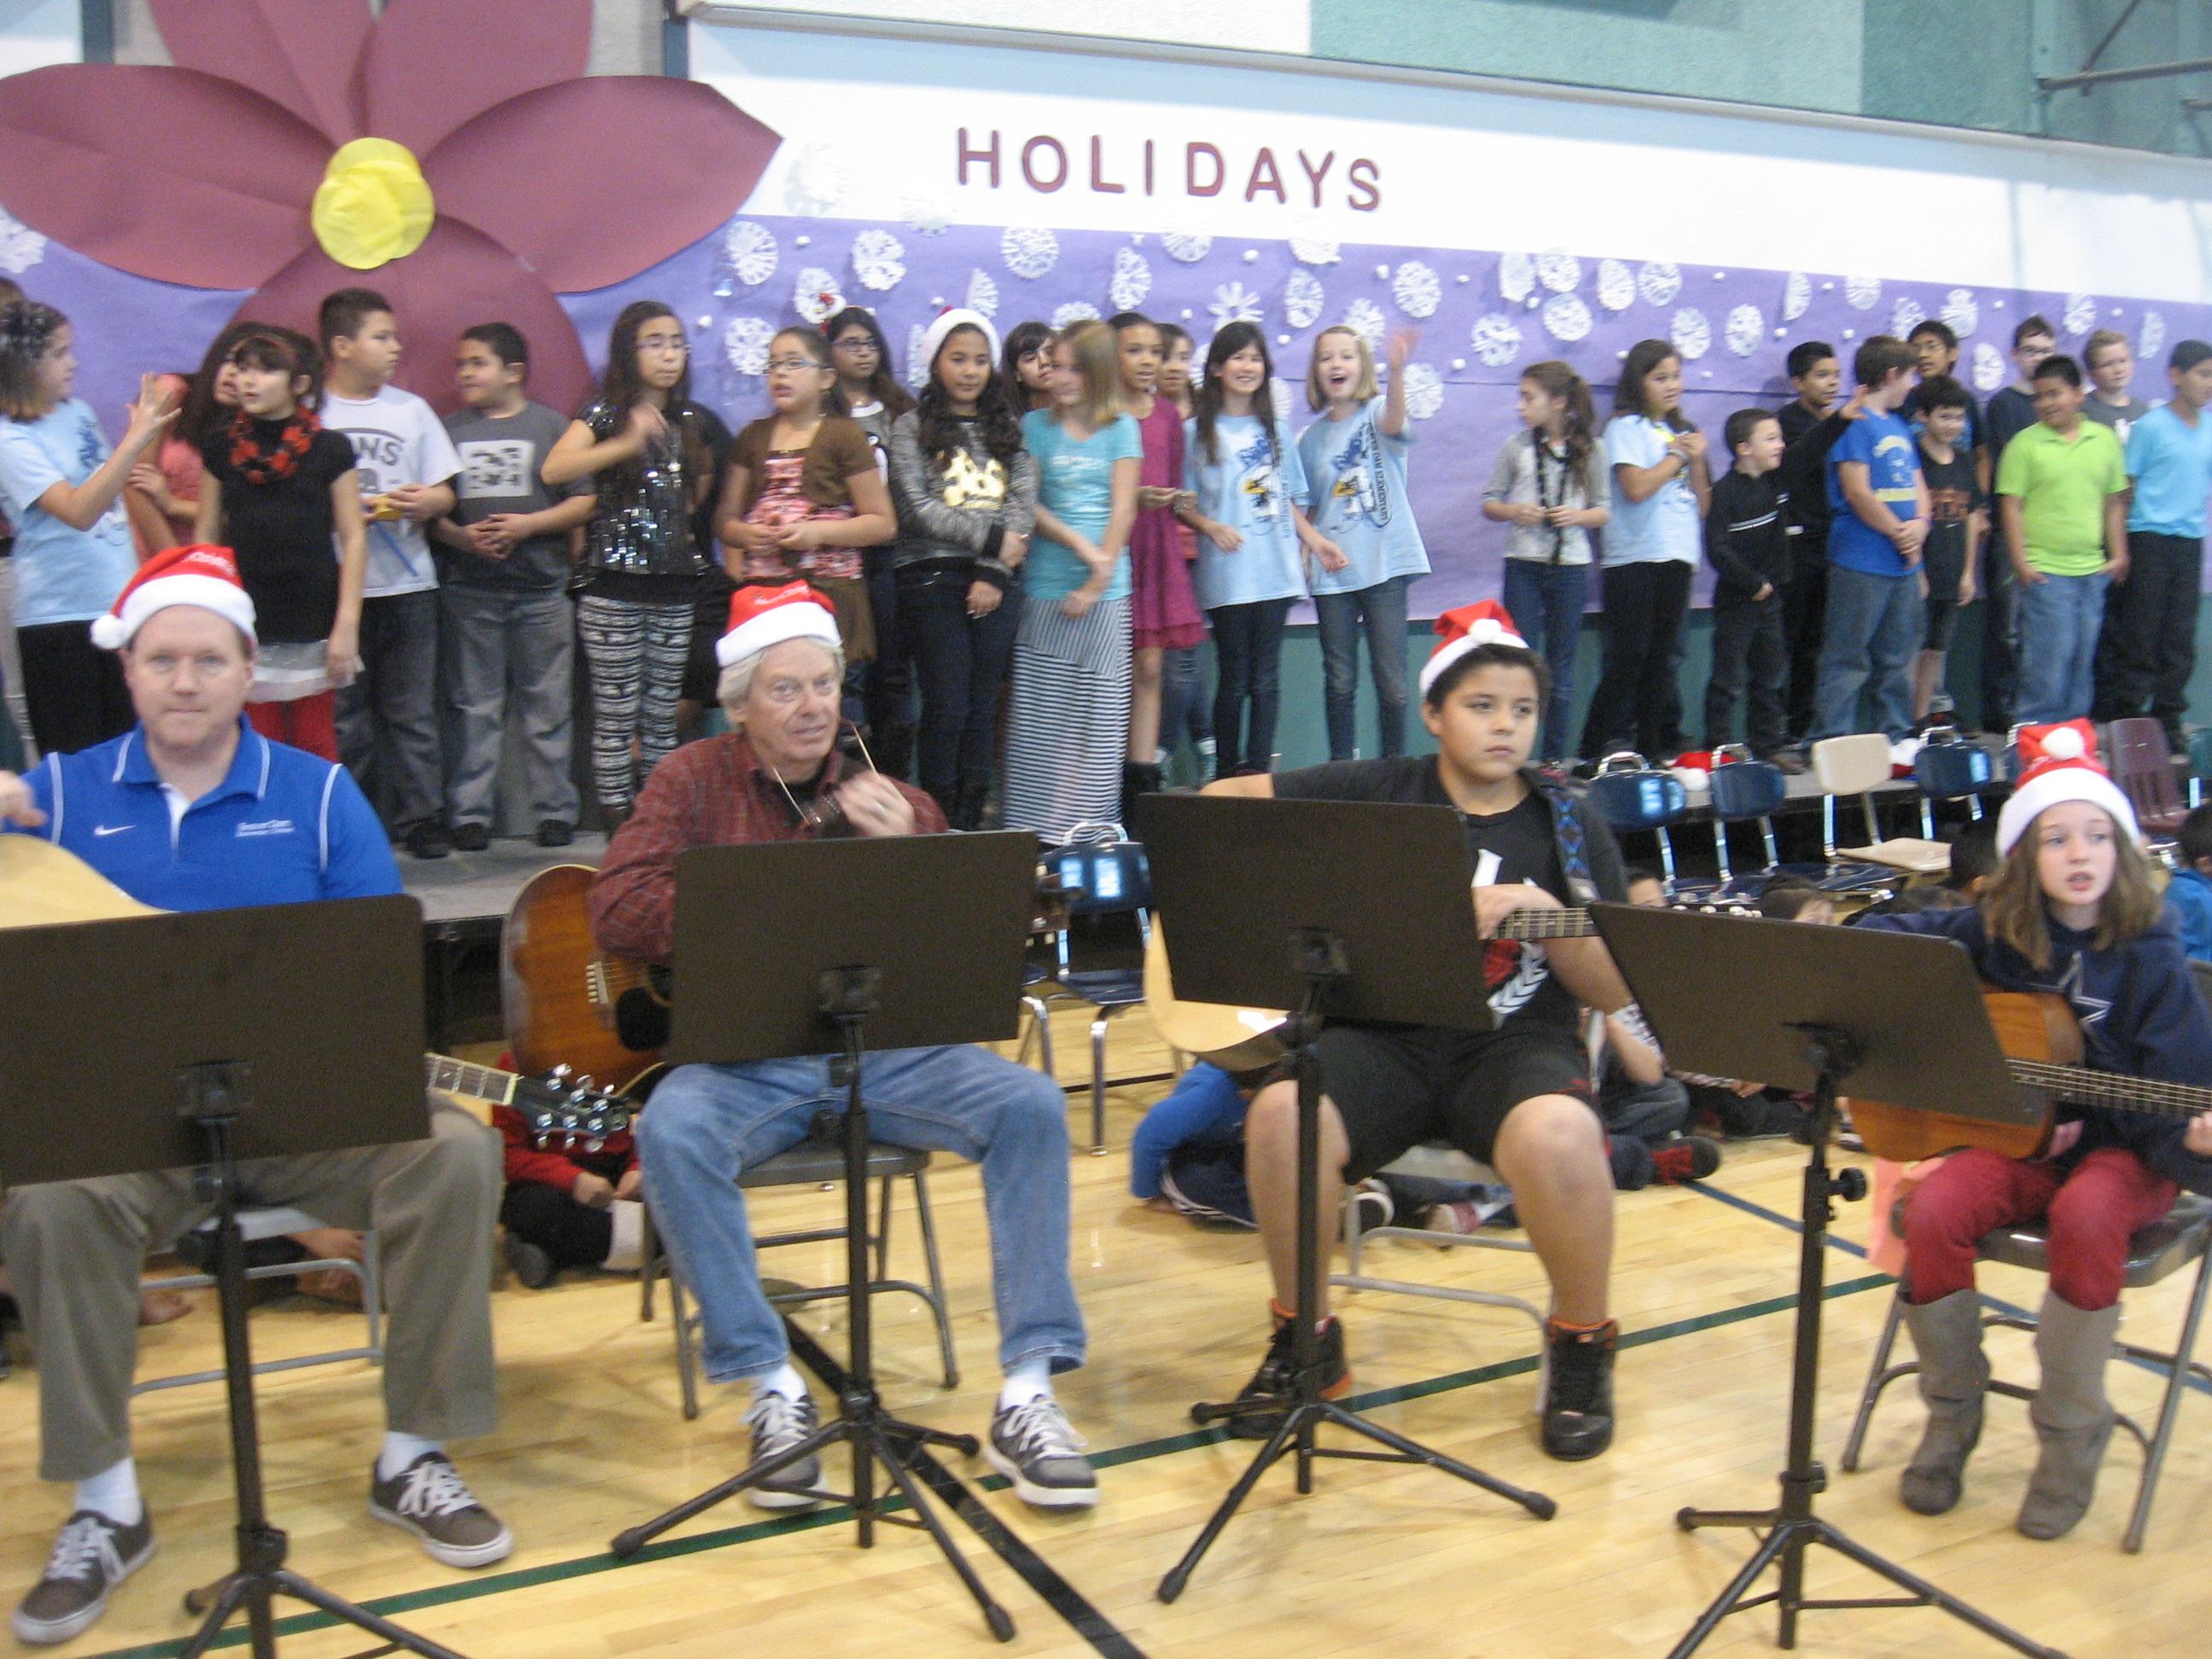 Happy Holidays Concert Program at Beaver Dam Elementary School